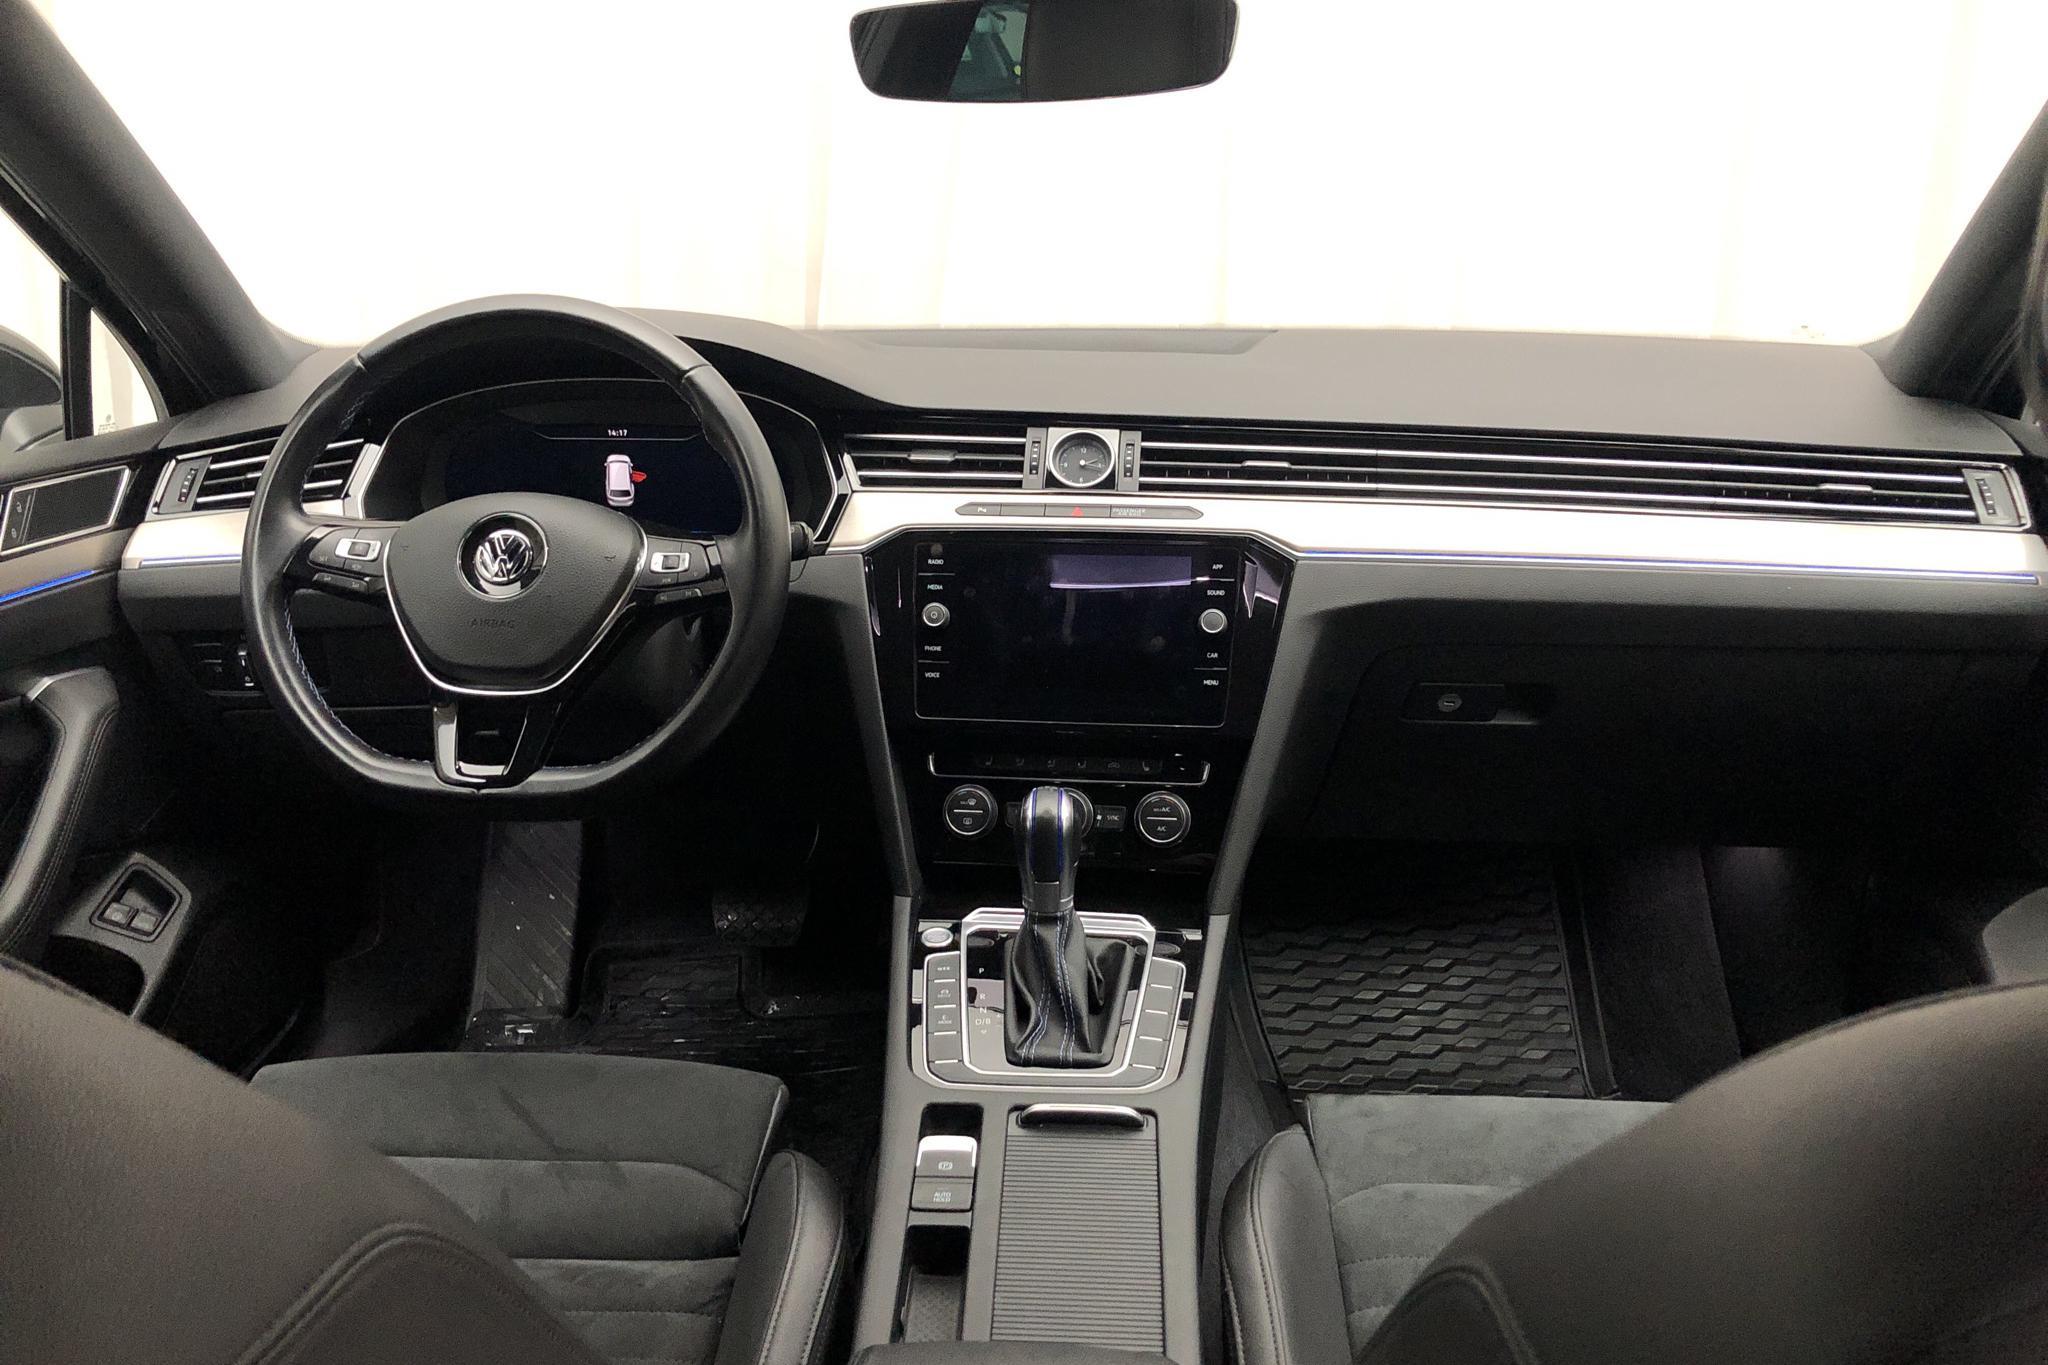 VW Passat 1.4 Plug-in-Hybrid Sportscombi (218hk) - 68 260 km - Automatic - Dark Grey - 2019